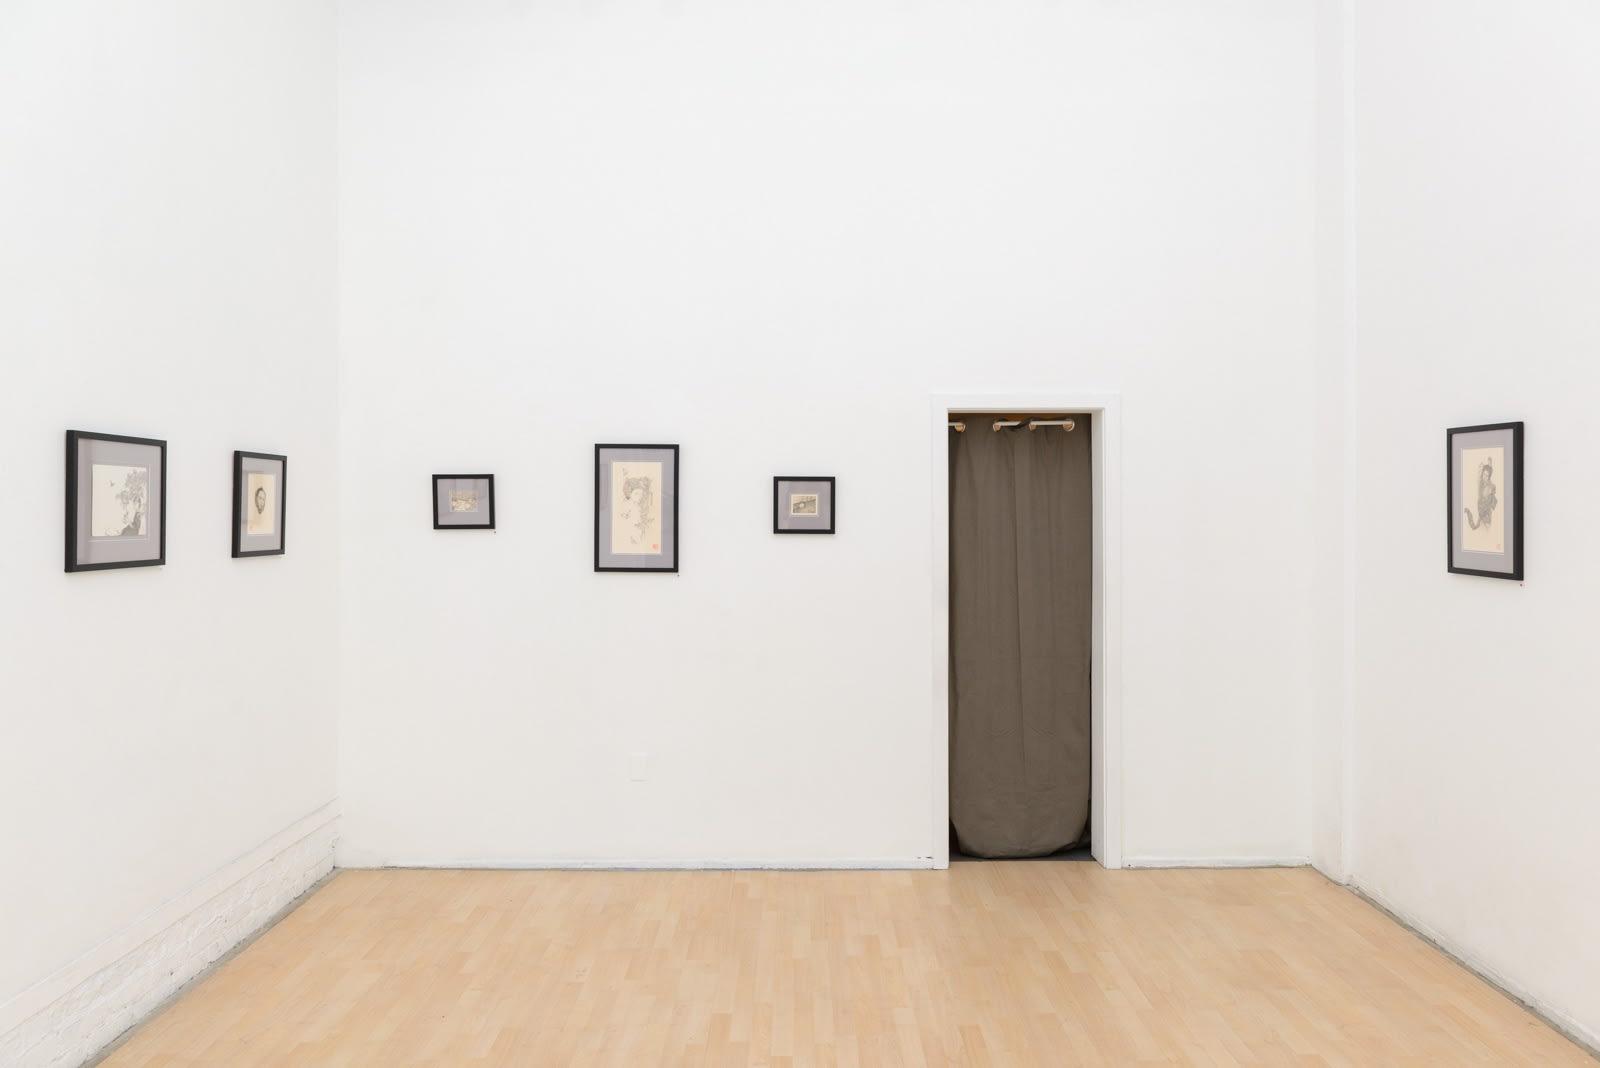 Installation view of artist Ozabu's solo exhibition Meguru at Hashimoto Contemporary, San Francisco.